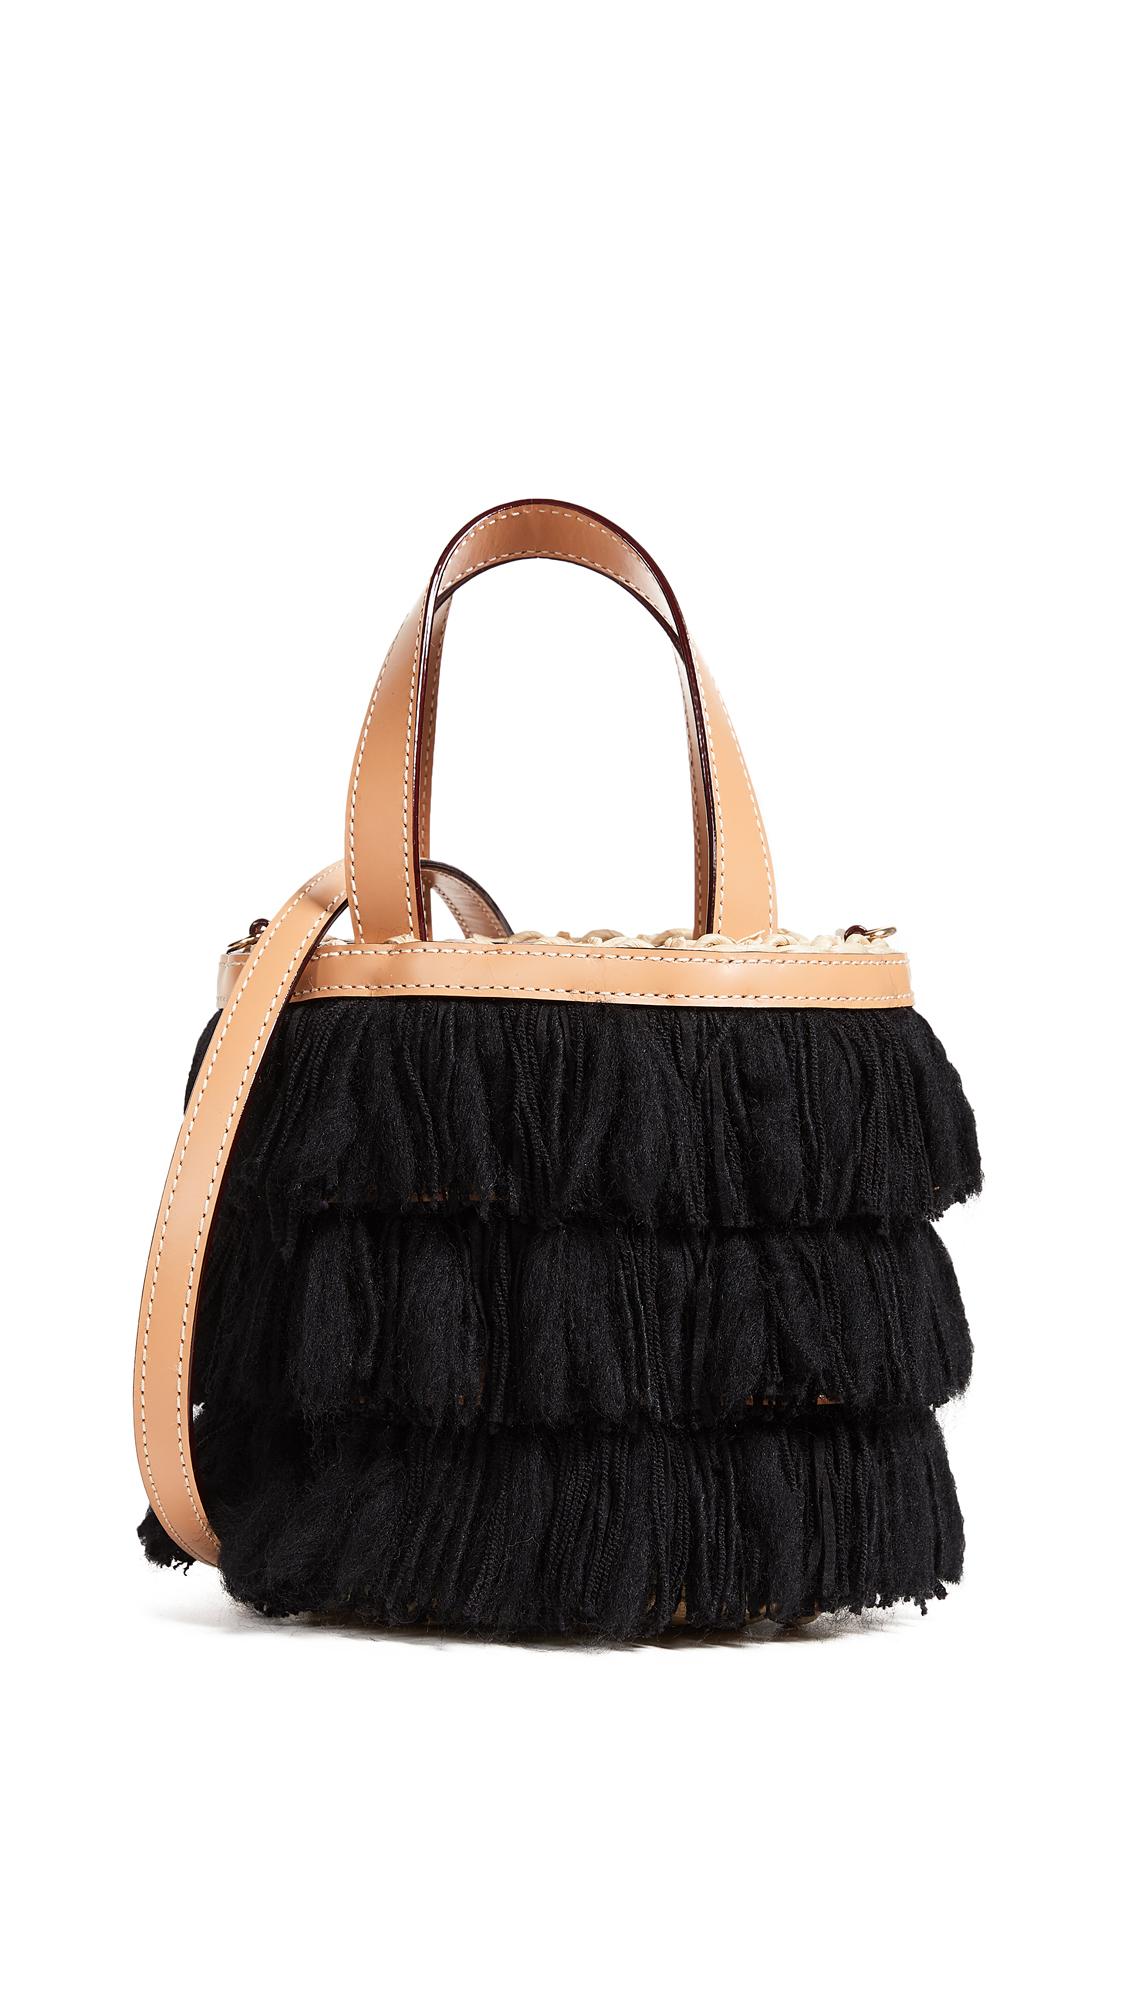 FRANCES VALENTINE SMALL FRINGE BUCKET BAG